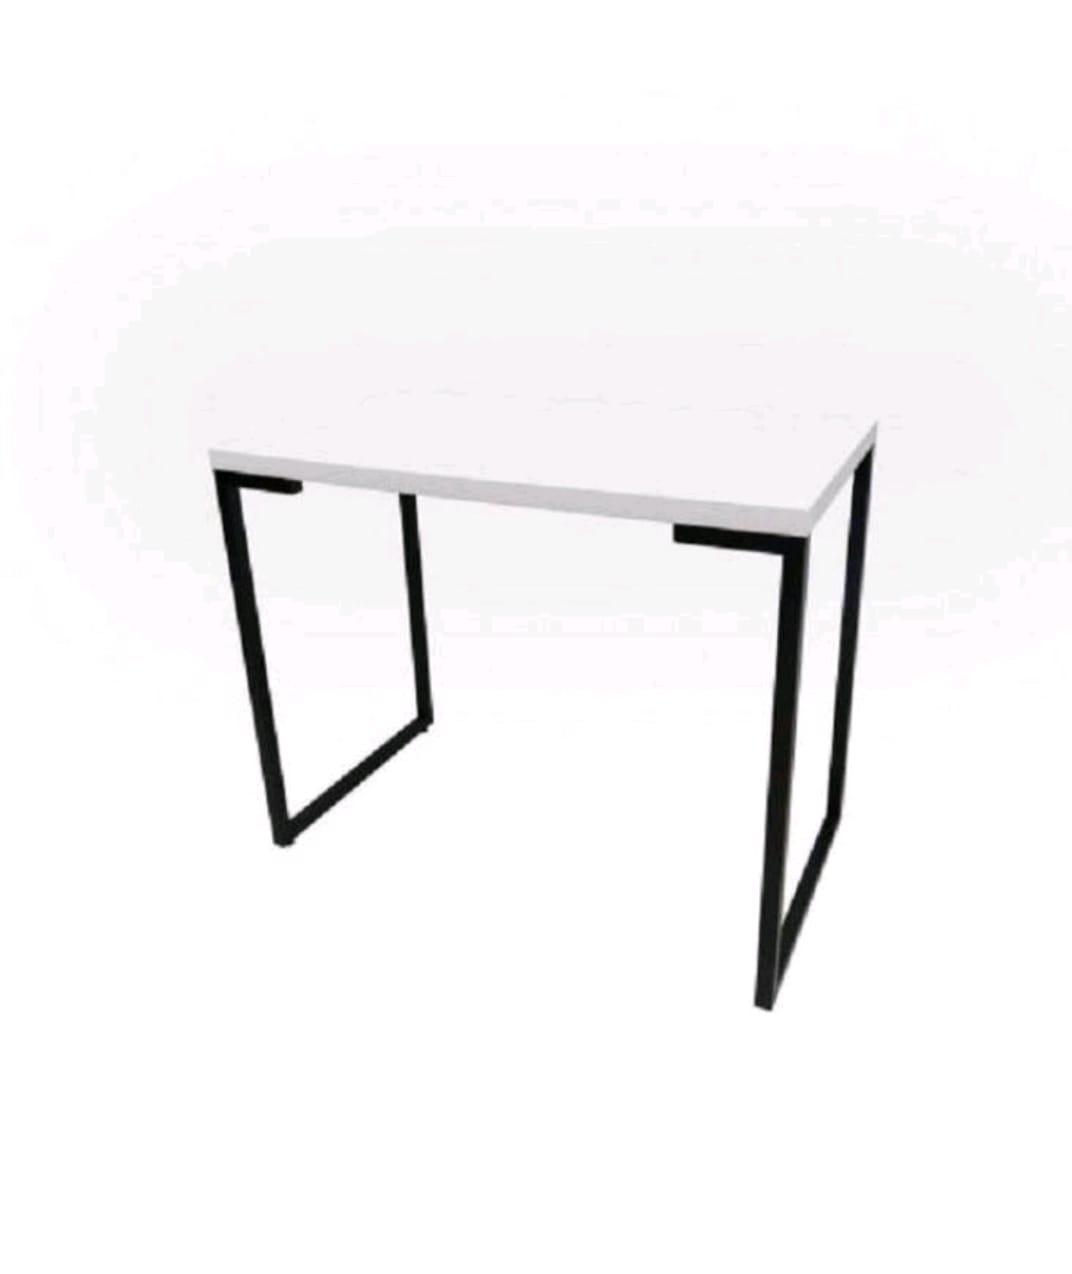 Escrivaninha 90cm Monoversátil Móveis Branco/Preto